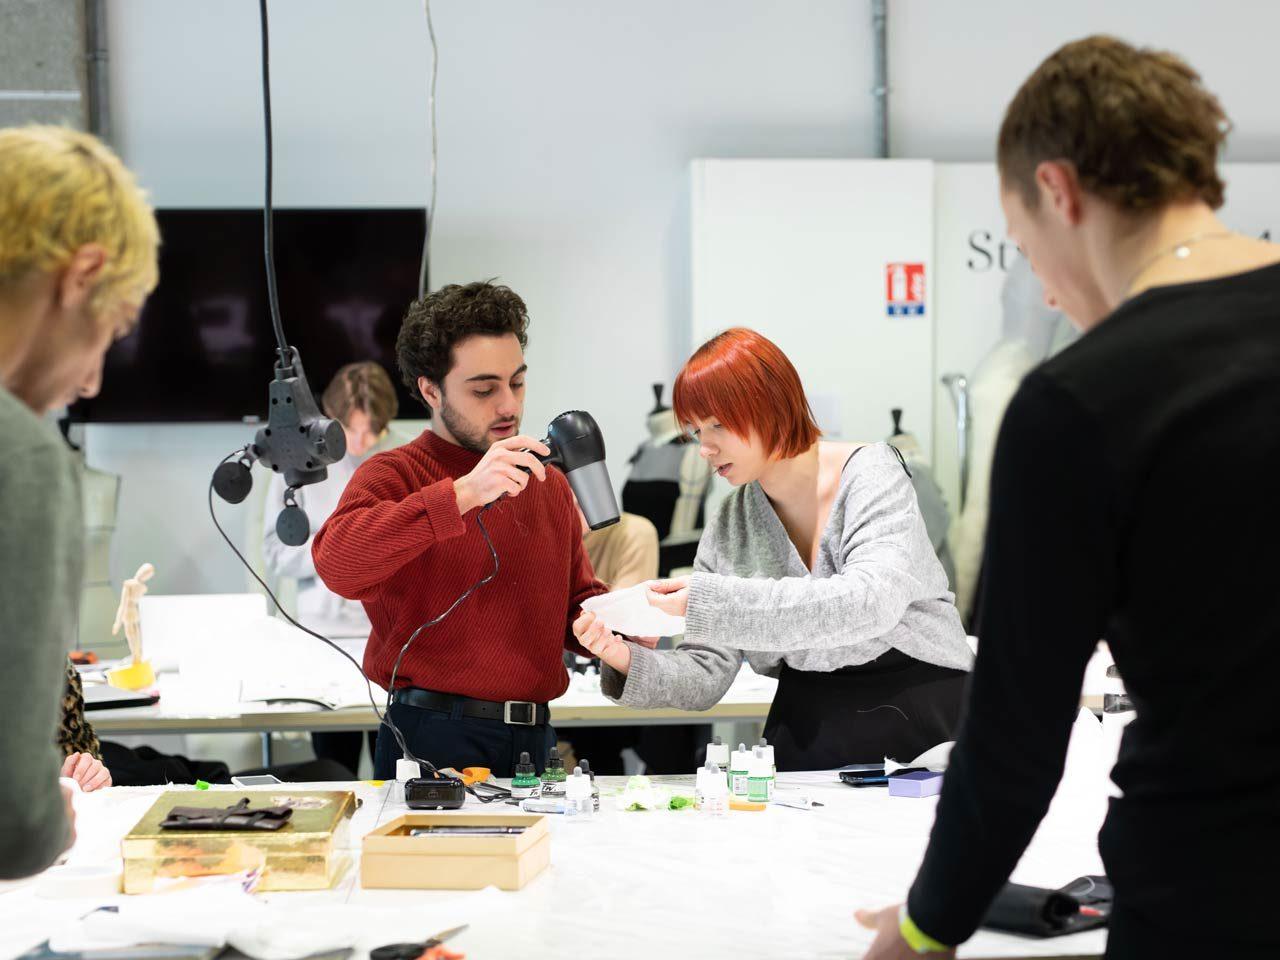 Institut Francais Mode apprentissage